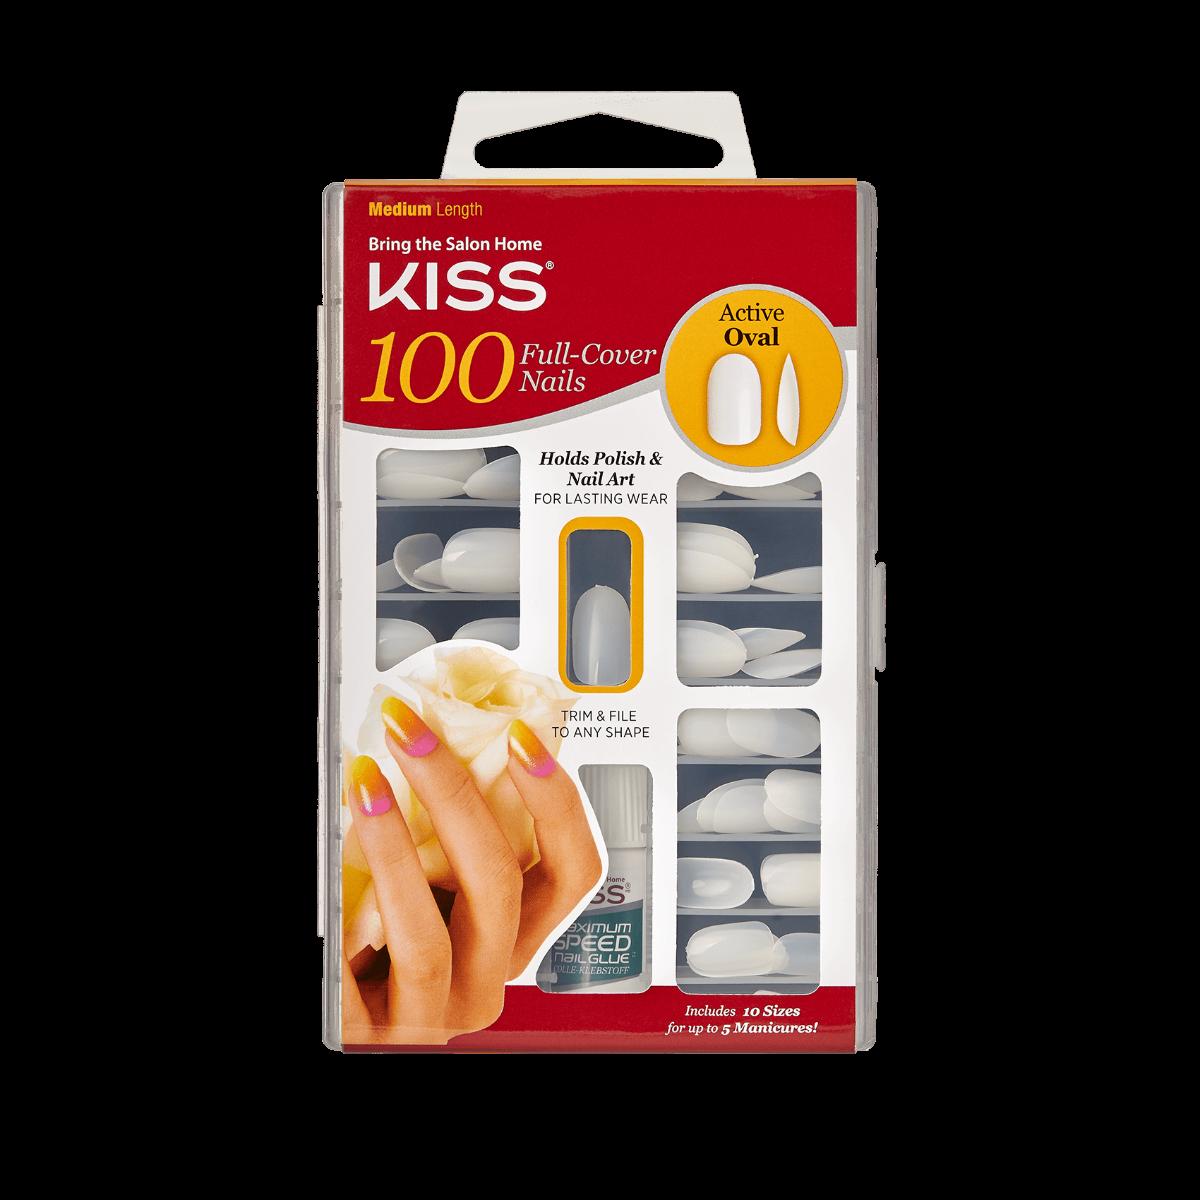 Kiss - KISS 100 Full-Cover Nail Kit Active Oval Medium Length